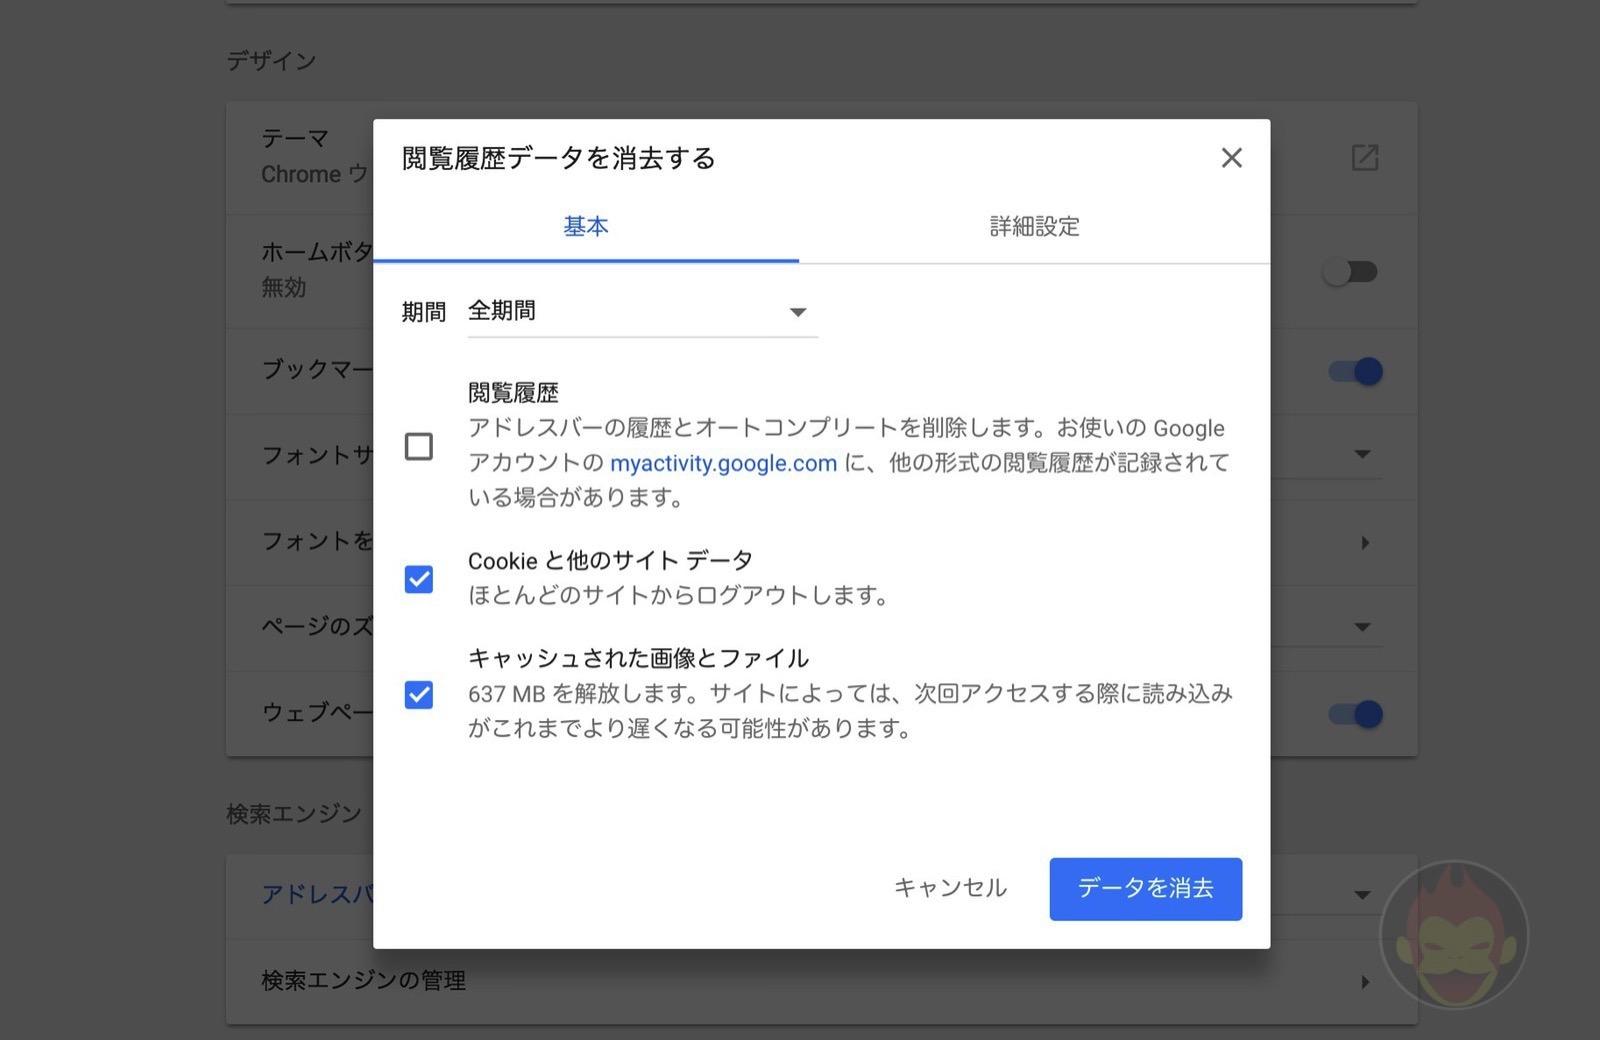 Google-Chrome-Deleting-Cache-and-Data-02.jpg